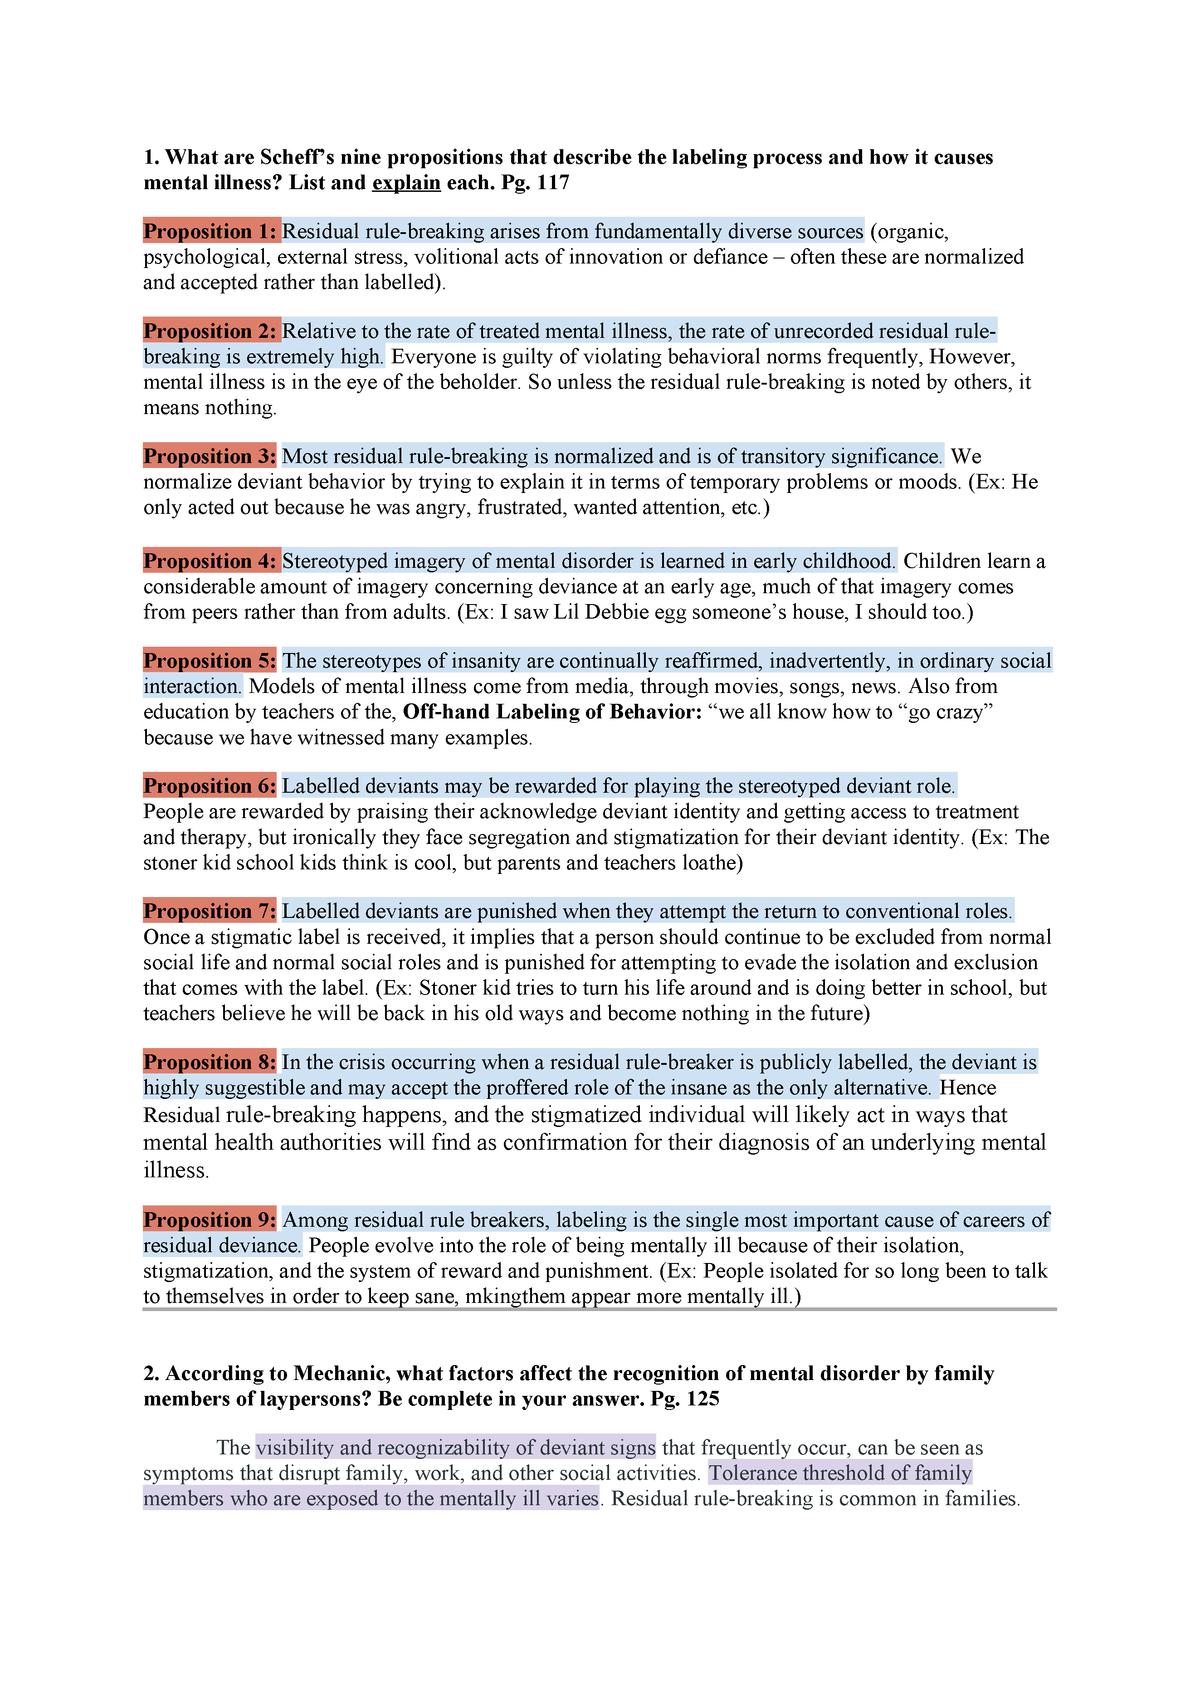 Exam 2018 - SOC 463 : Mental Health and Society - StuDocu